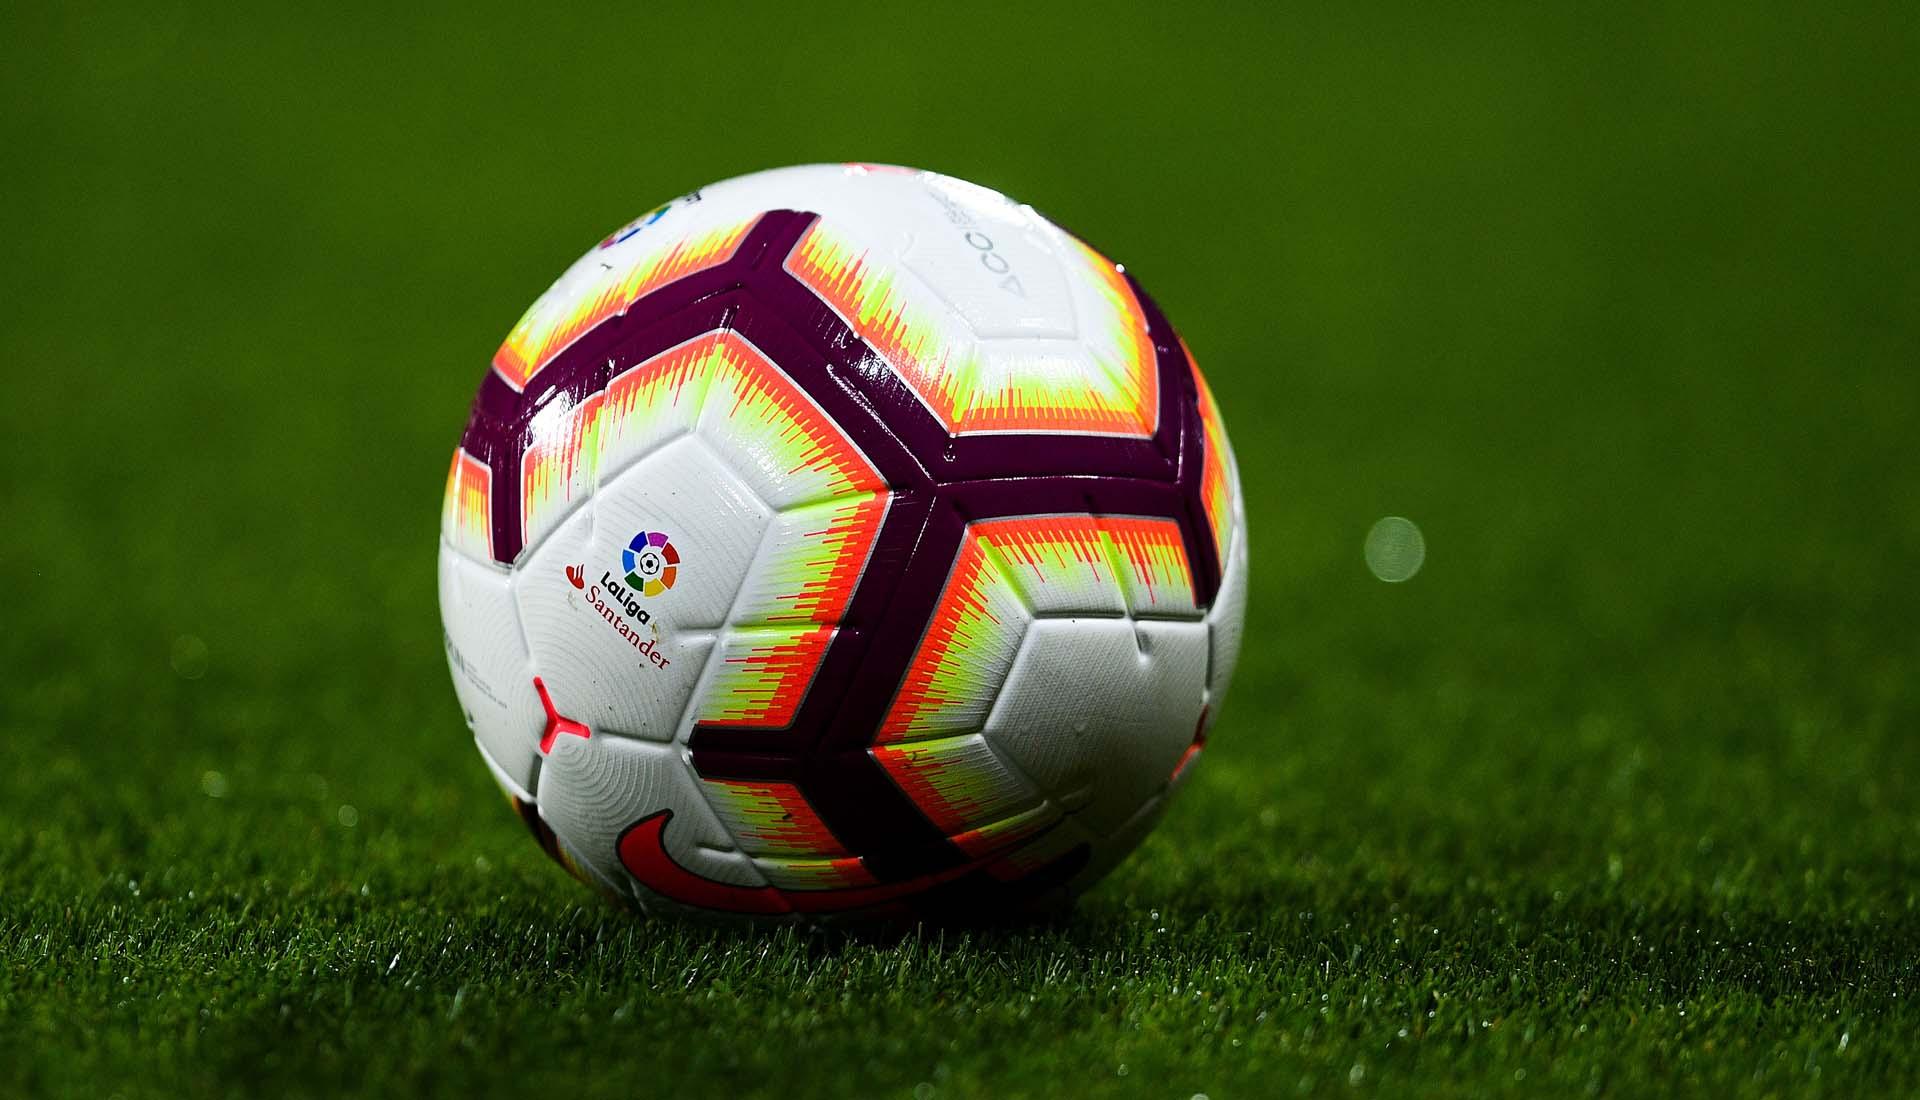 75ddaddb89d PUMA Announce Official Match Ball Deal With La Liga - SoccerBible.